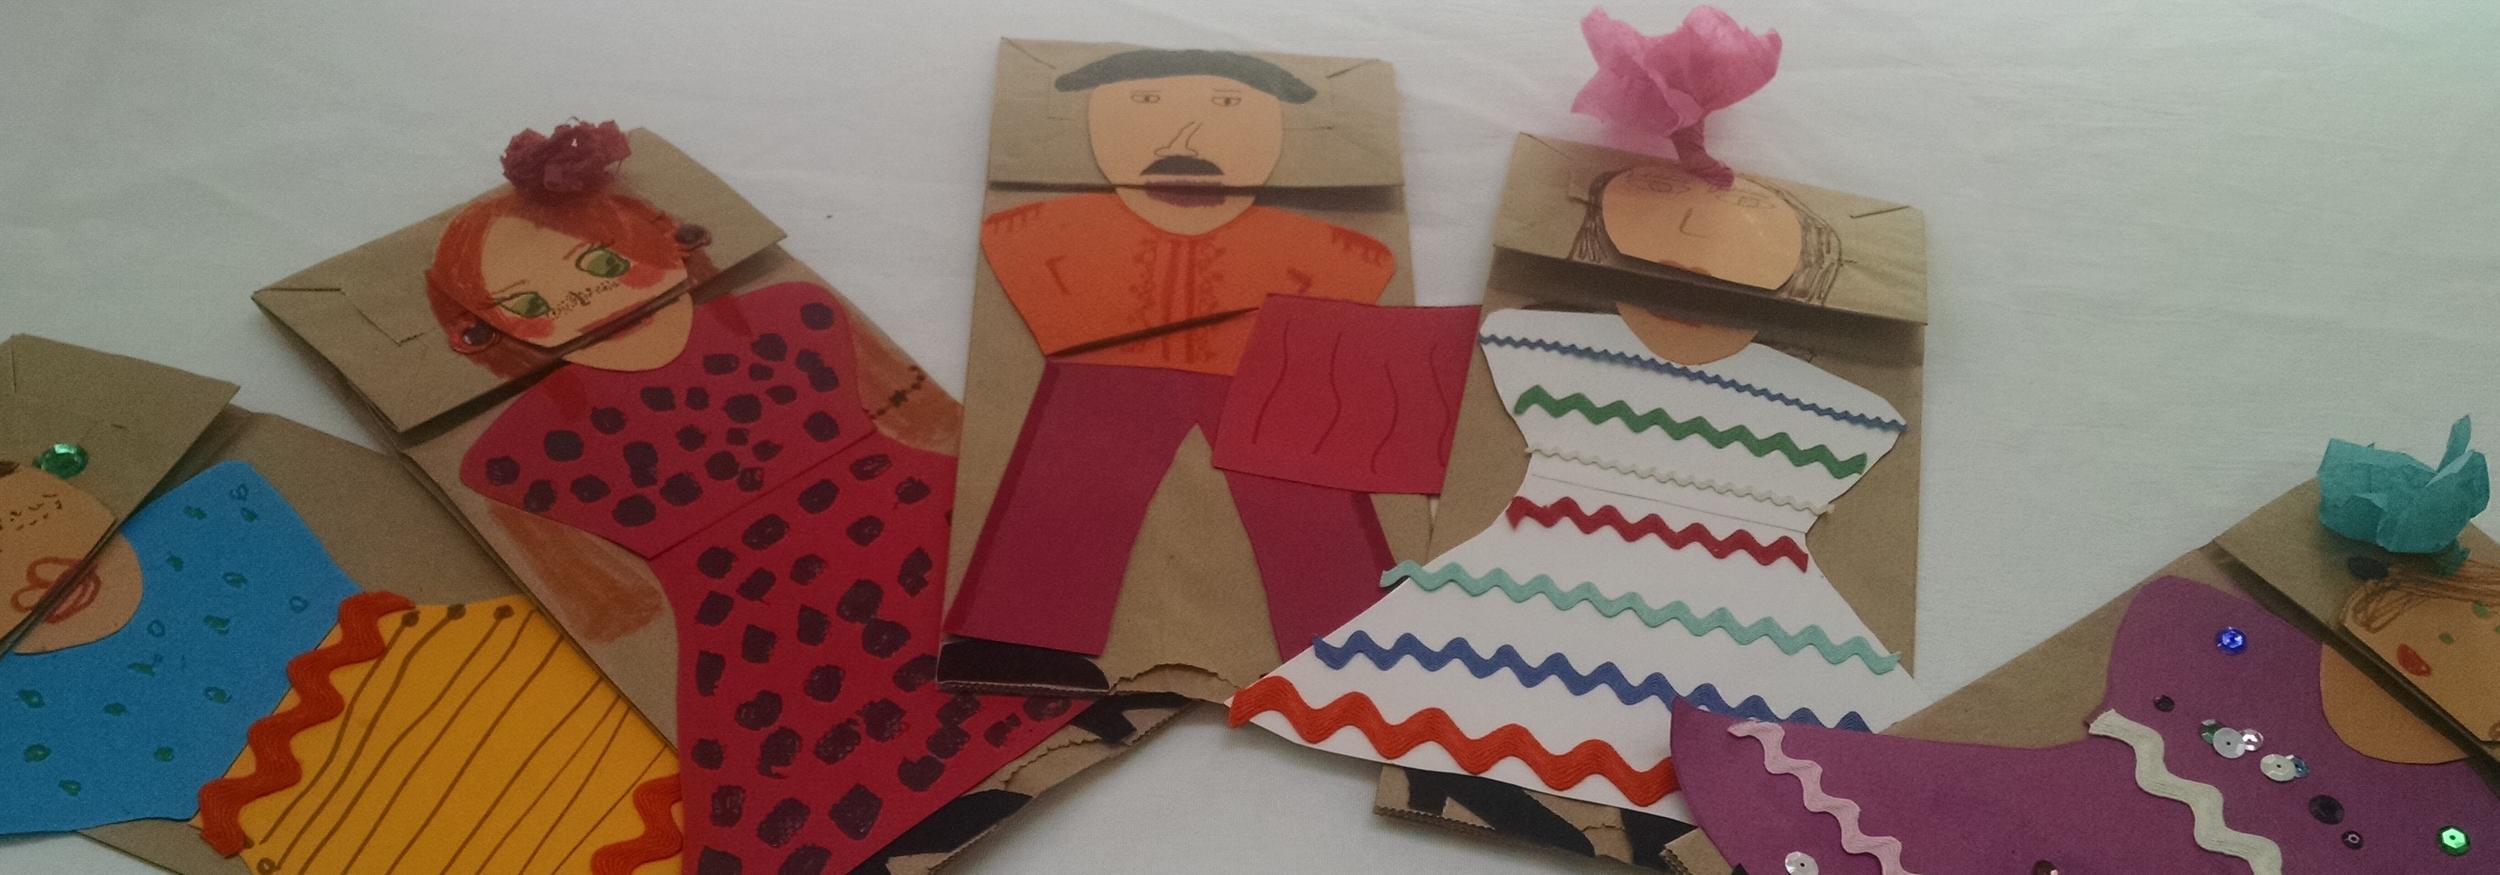 Flamenco puppets